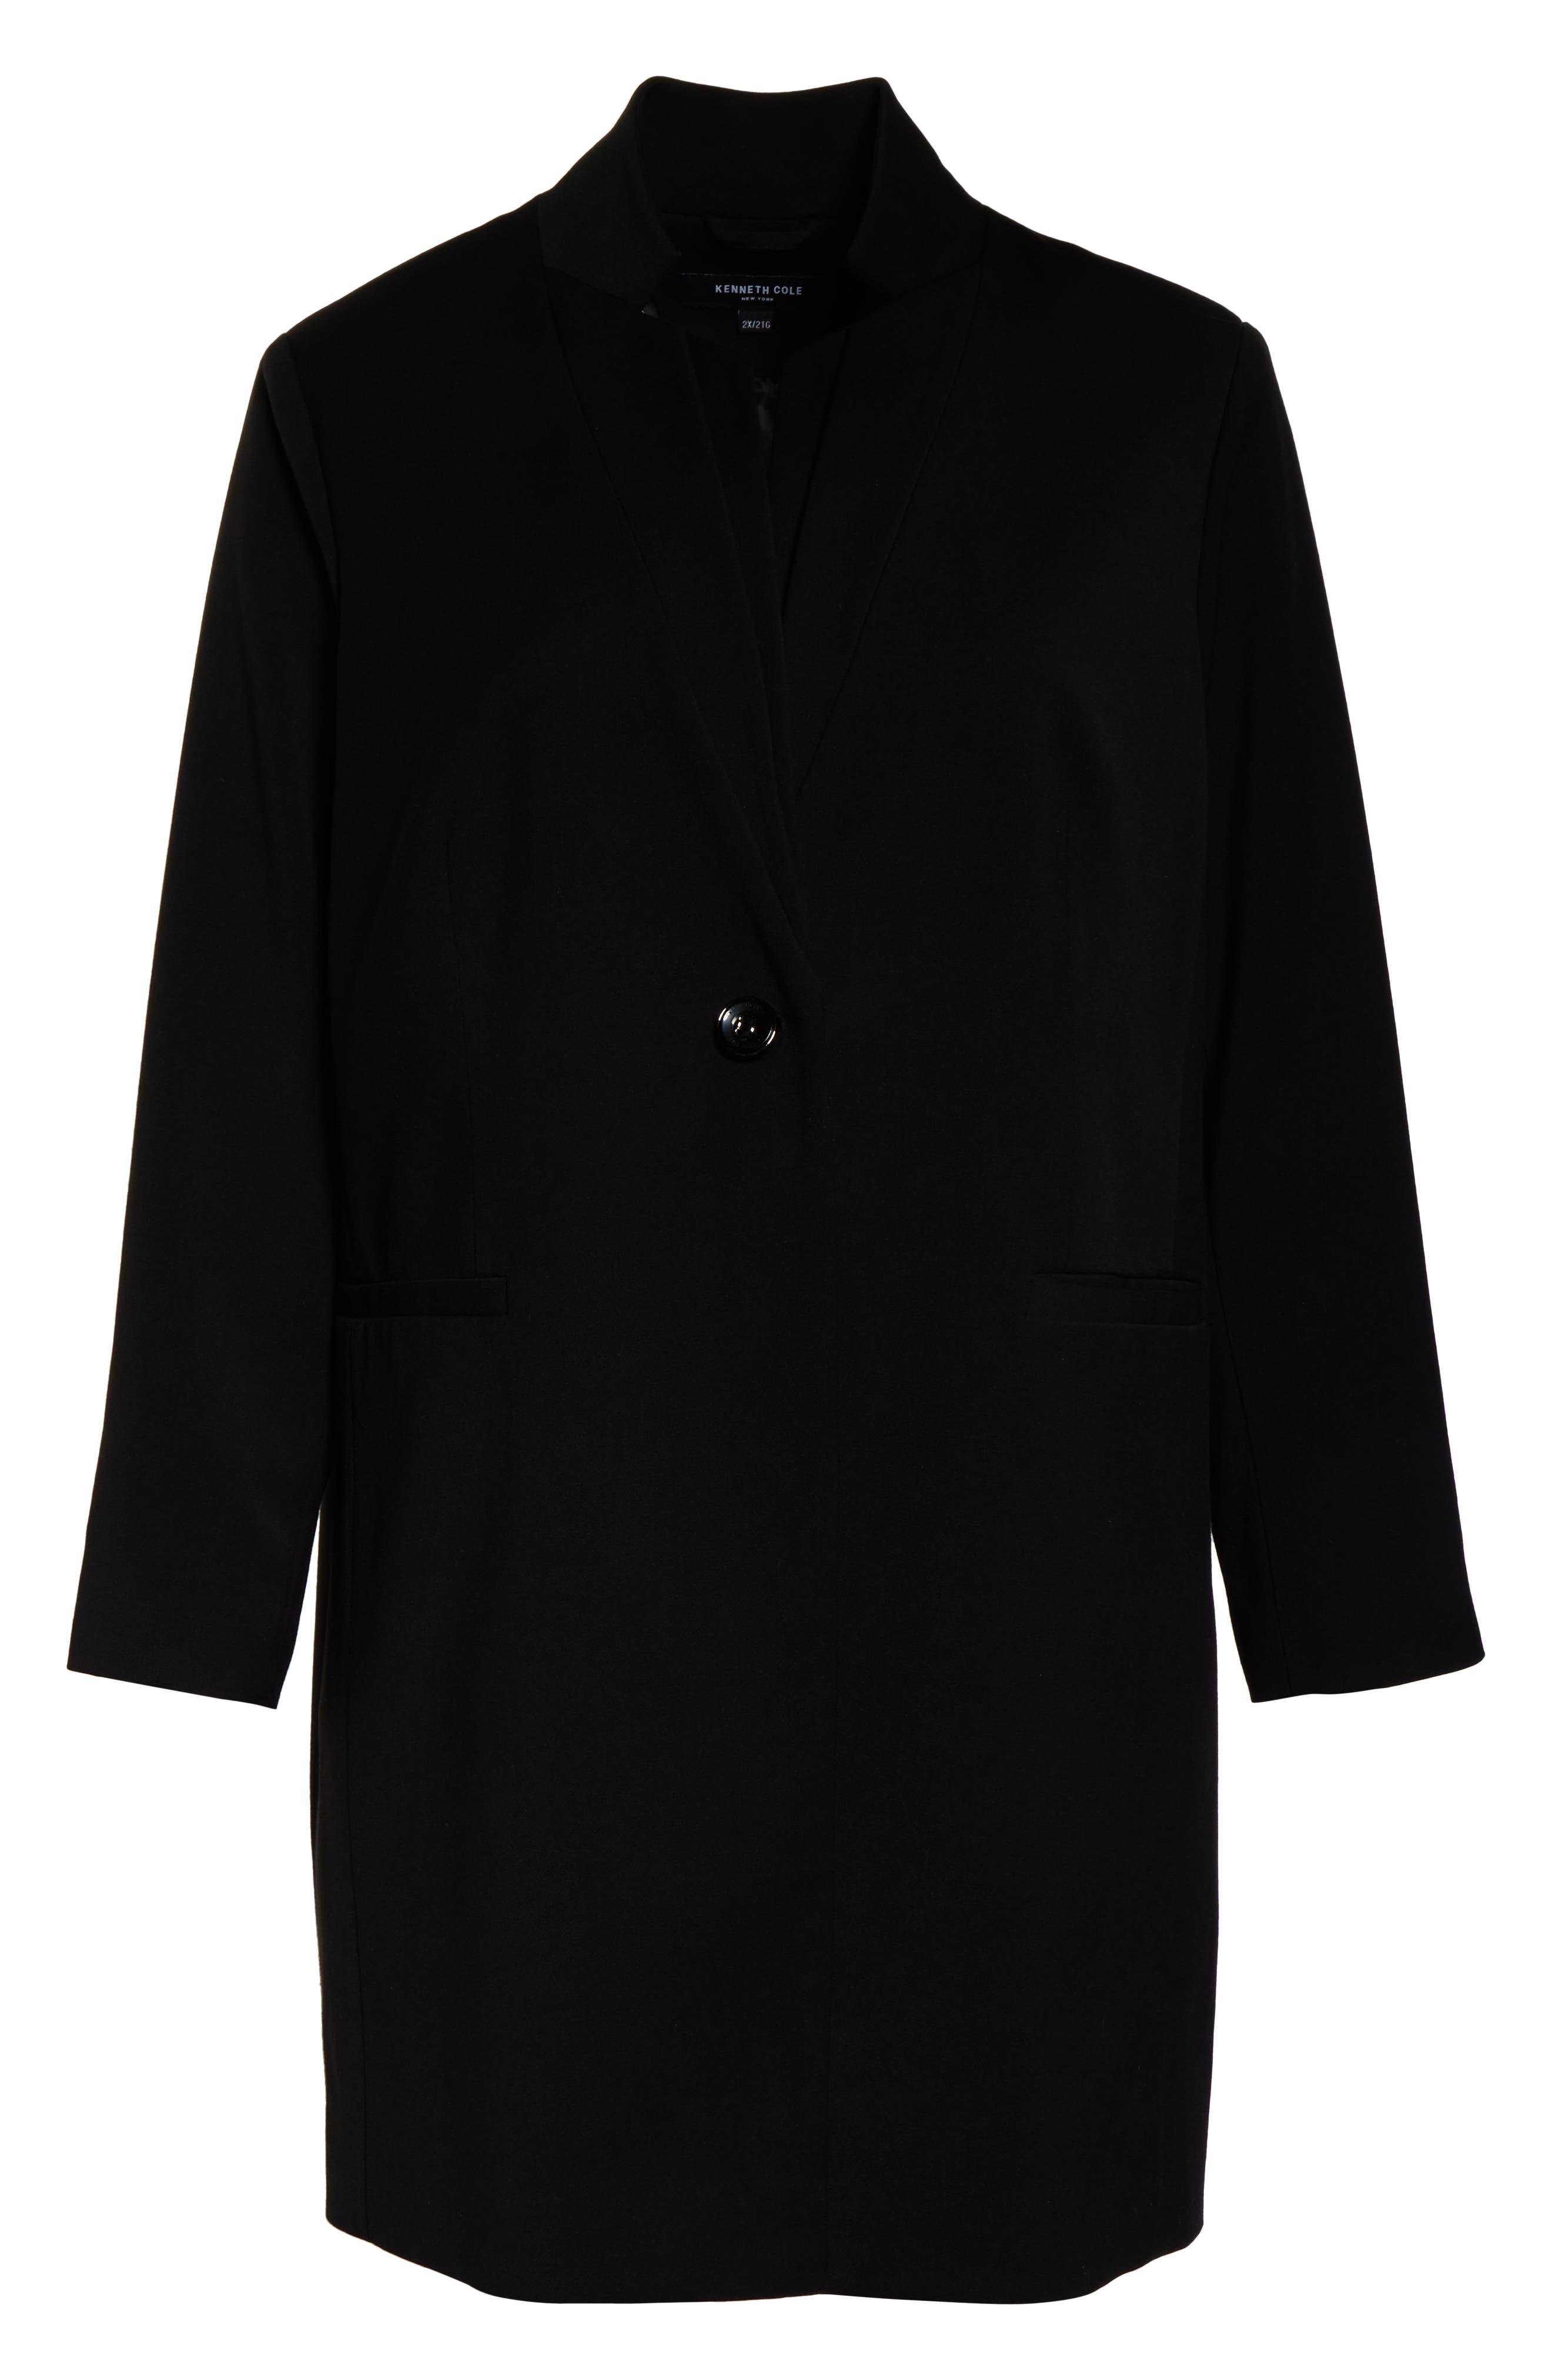 KENNETH COLE NEW YORK,                             Inverted Collar Ponte Jacket,                             Alternate thumbnail 5, color,                             BLACK